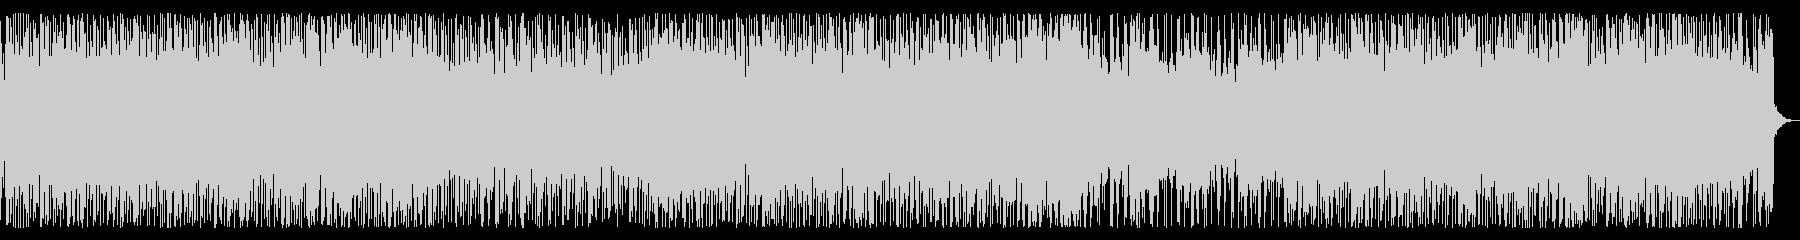 80s シンセロック・アウトラン・追跡の未再生の波形